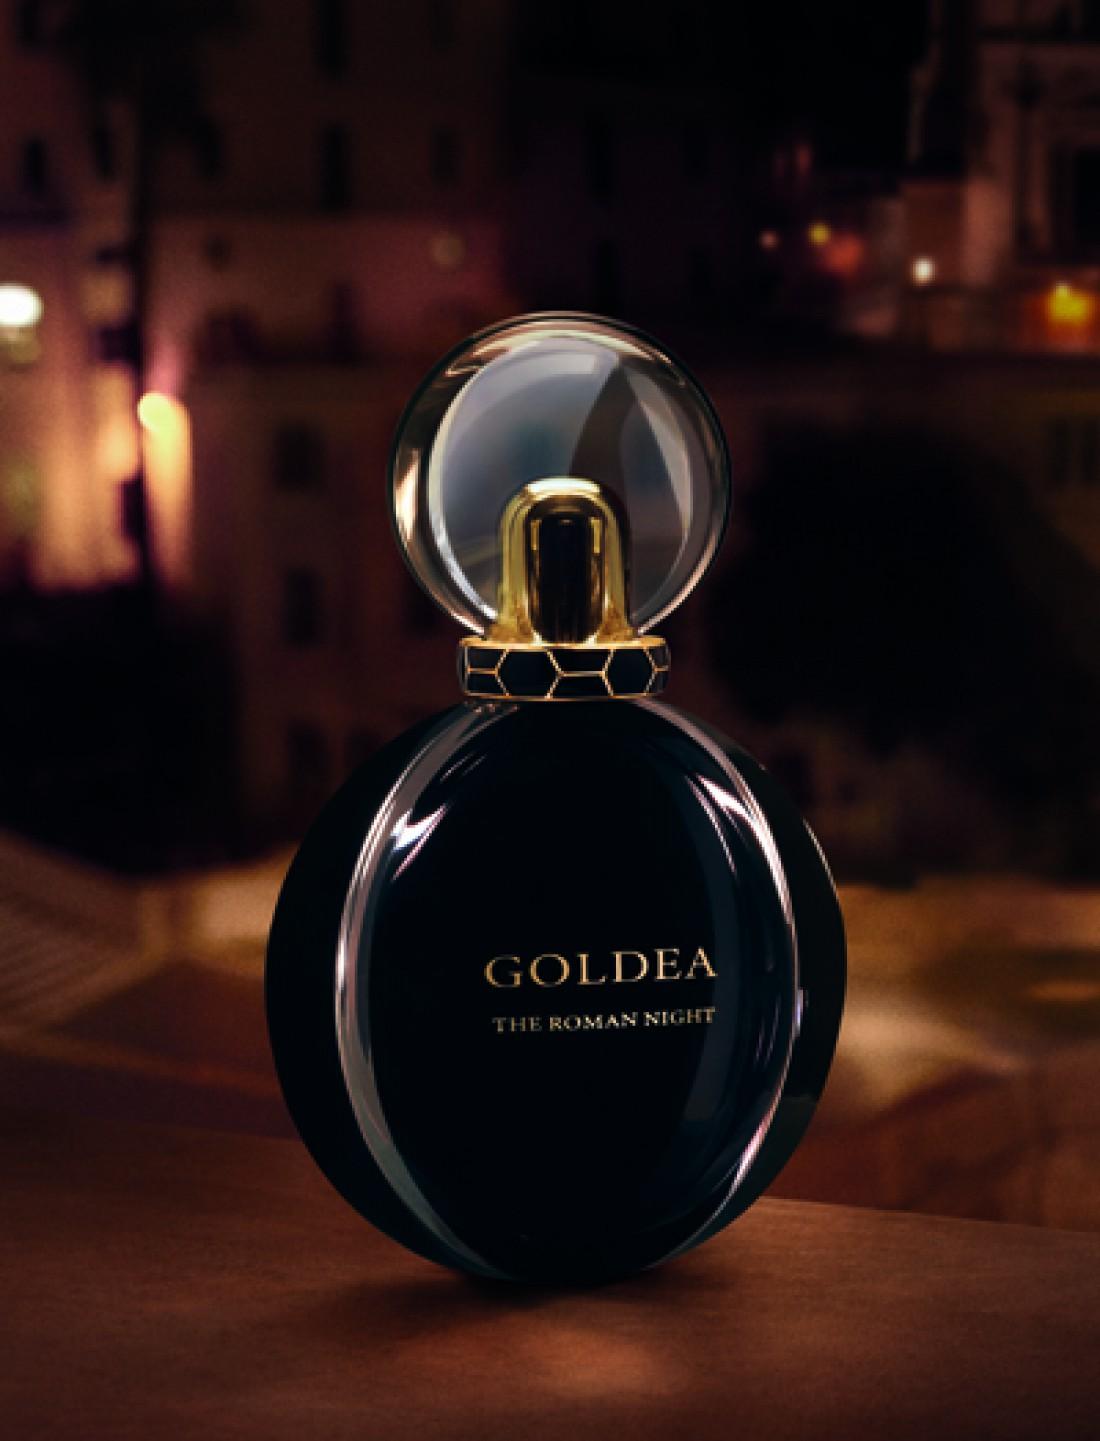 Bvlgari — Goldea The Roman Night